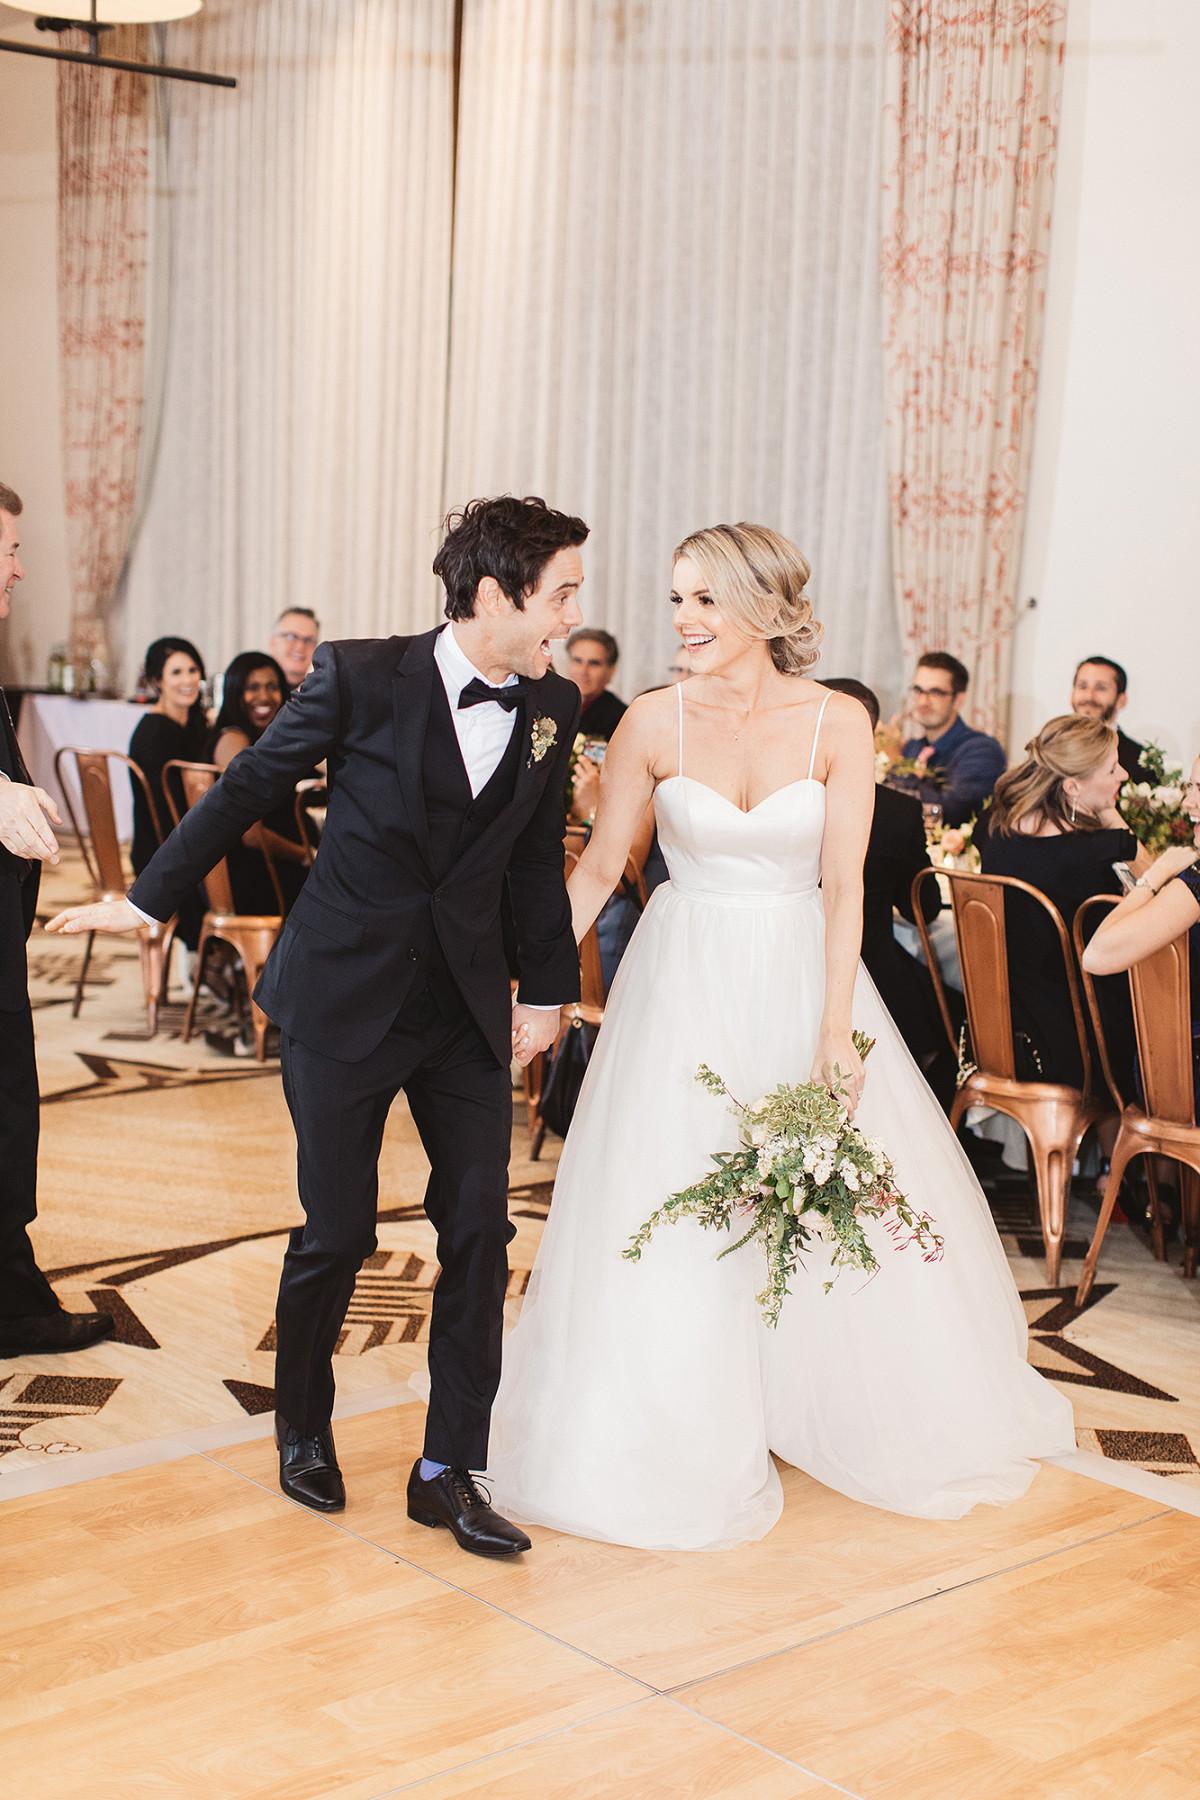 Ali Fedotowsky + Kevin Manno - In Moonlight Bridal